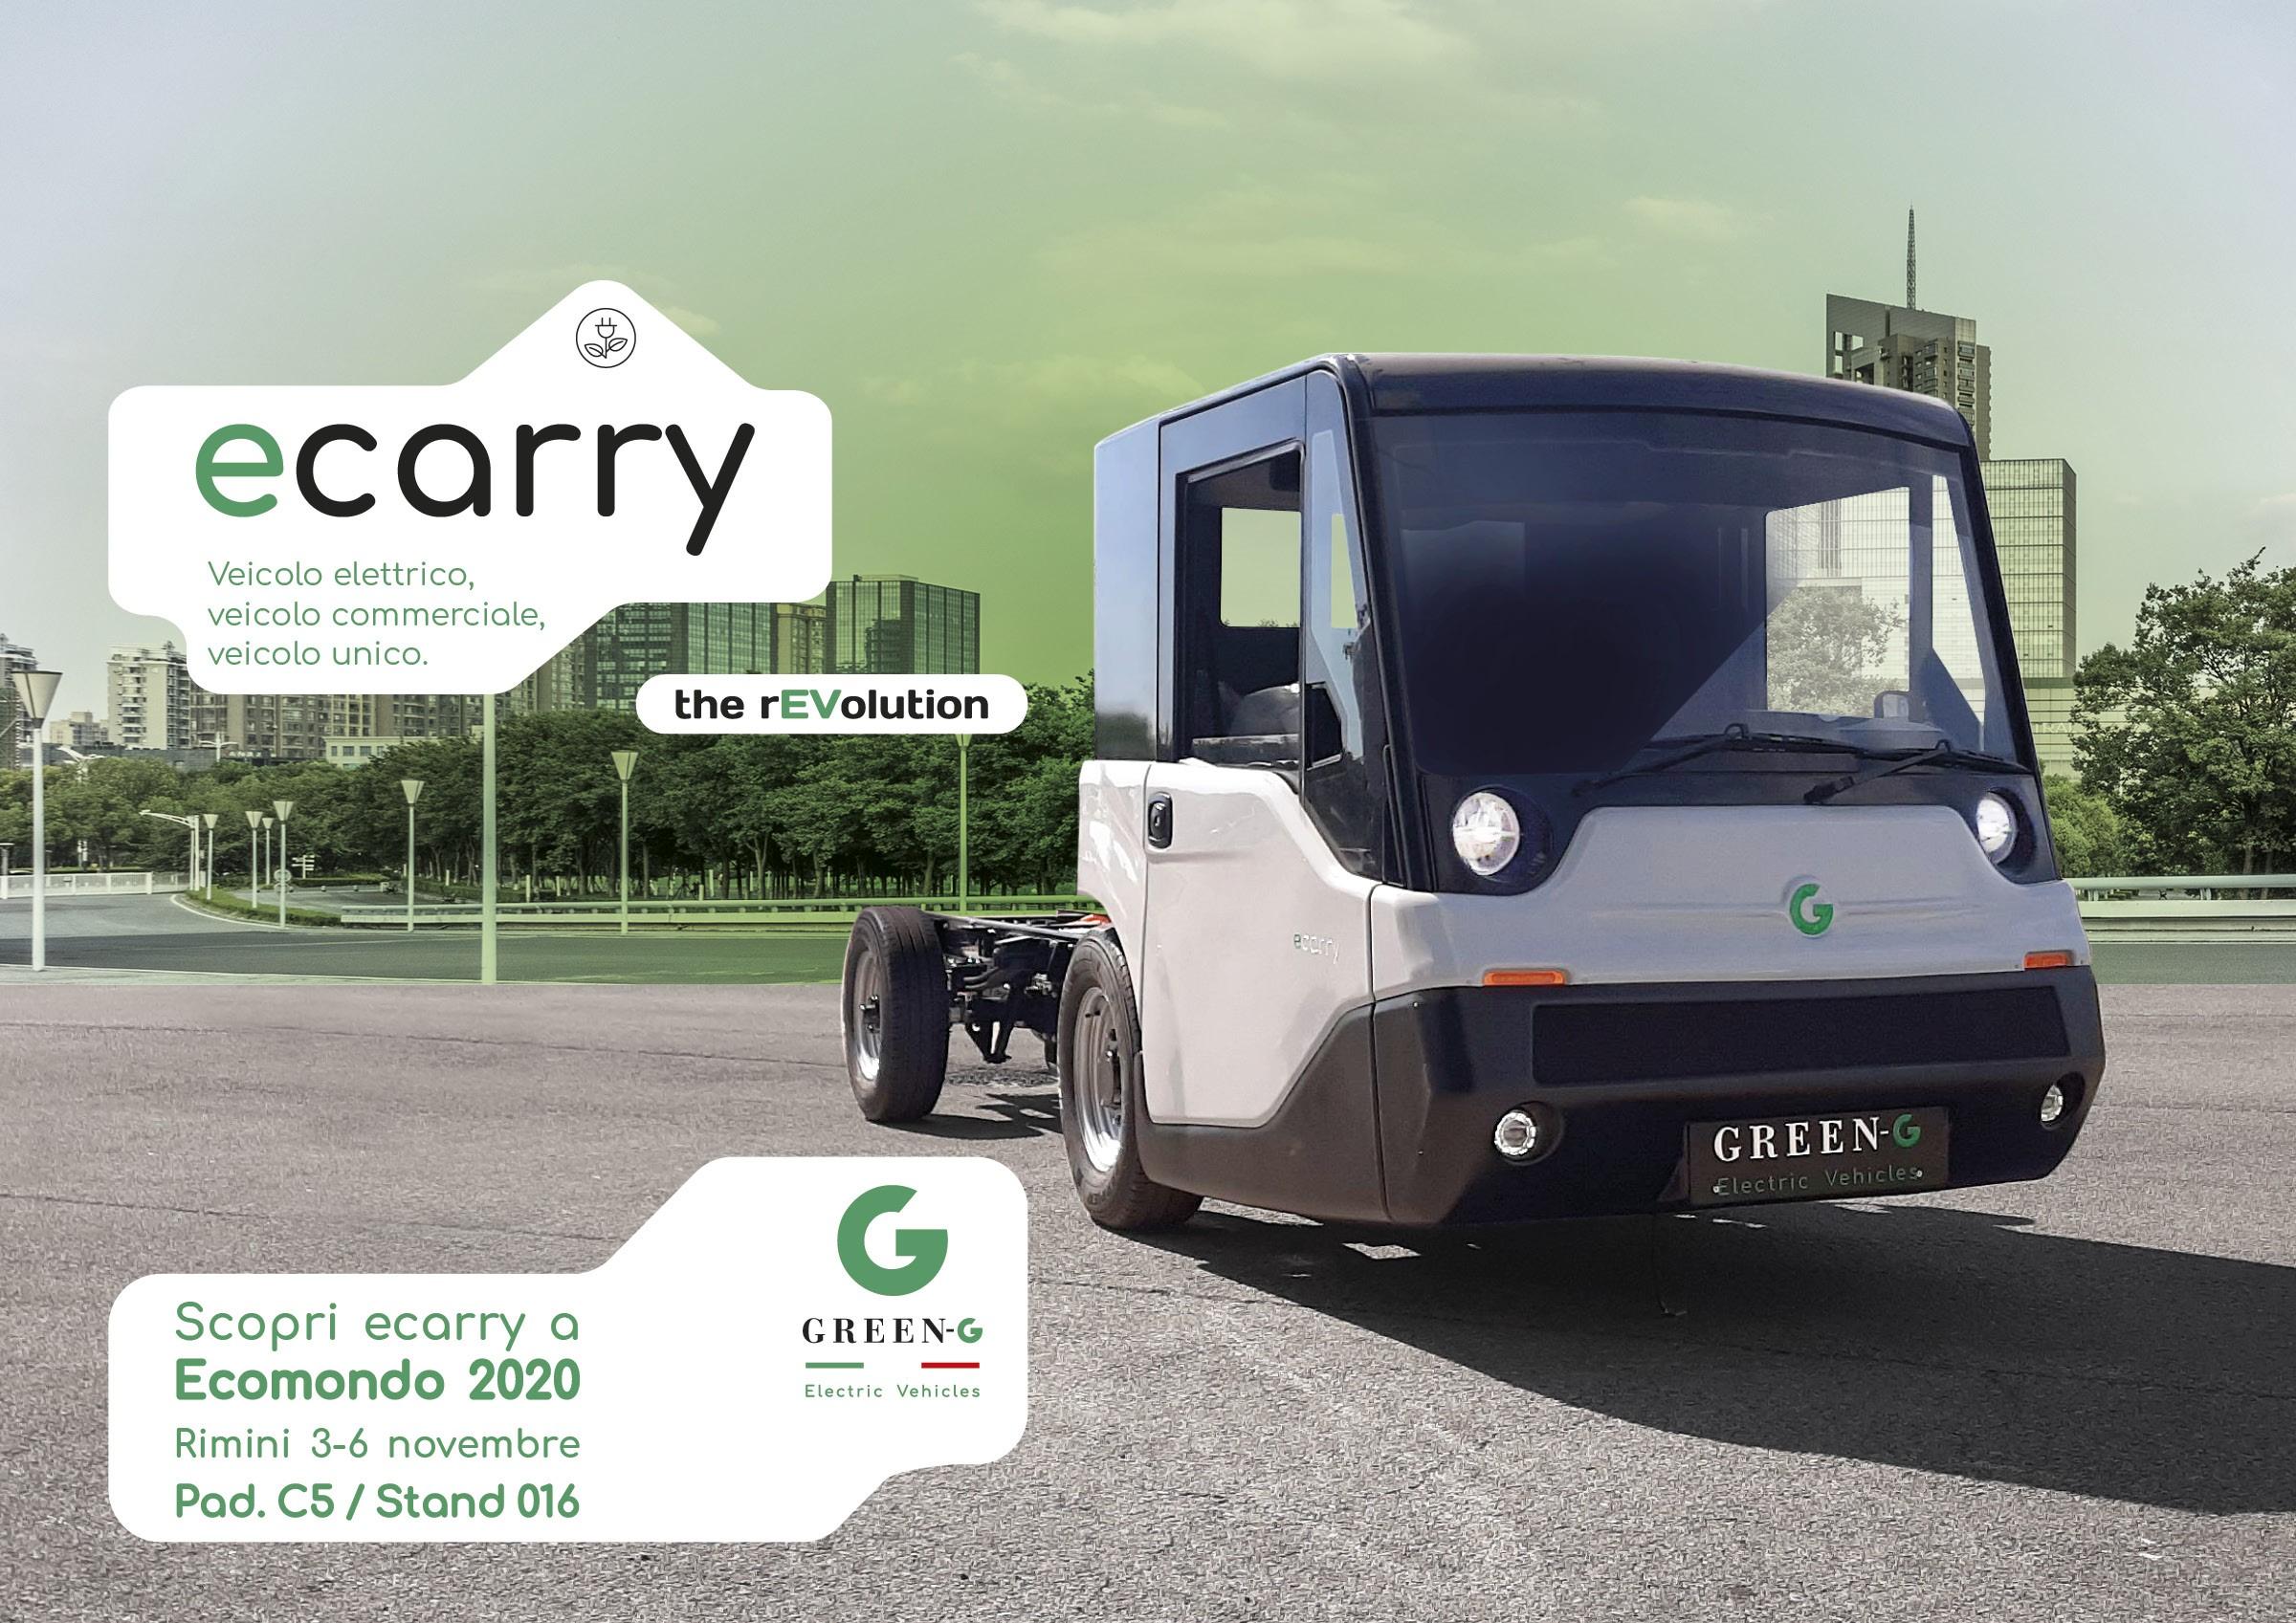 greeng-ecarry-ecomondo-2020